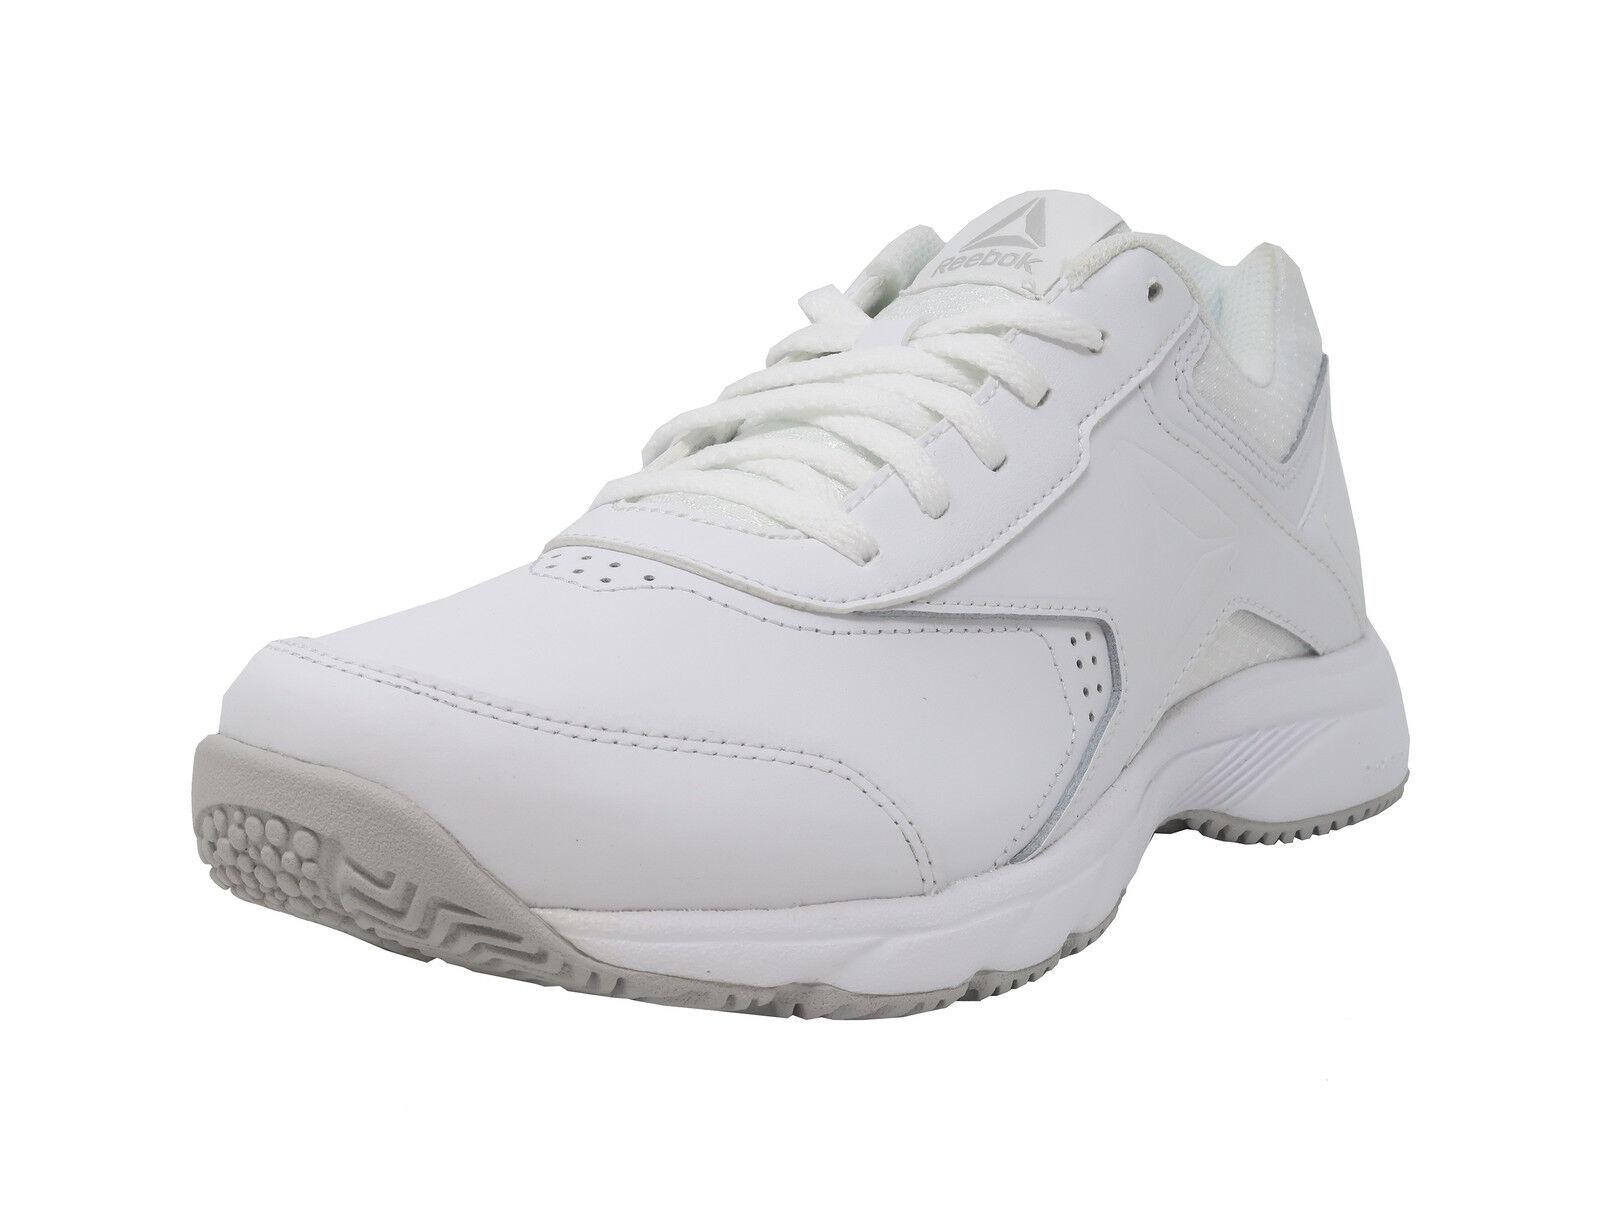 REEBOK Work N Cushion 3.0 White Wide MemoryTech Sneakers Lace Up Women Shoes